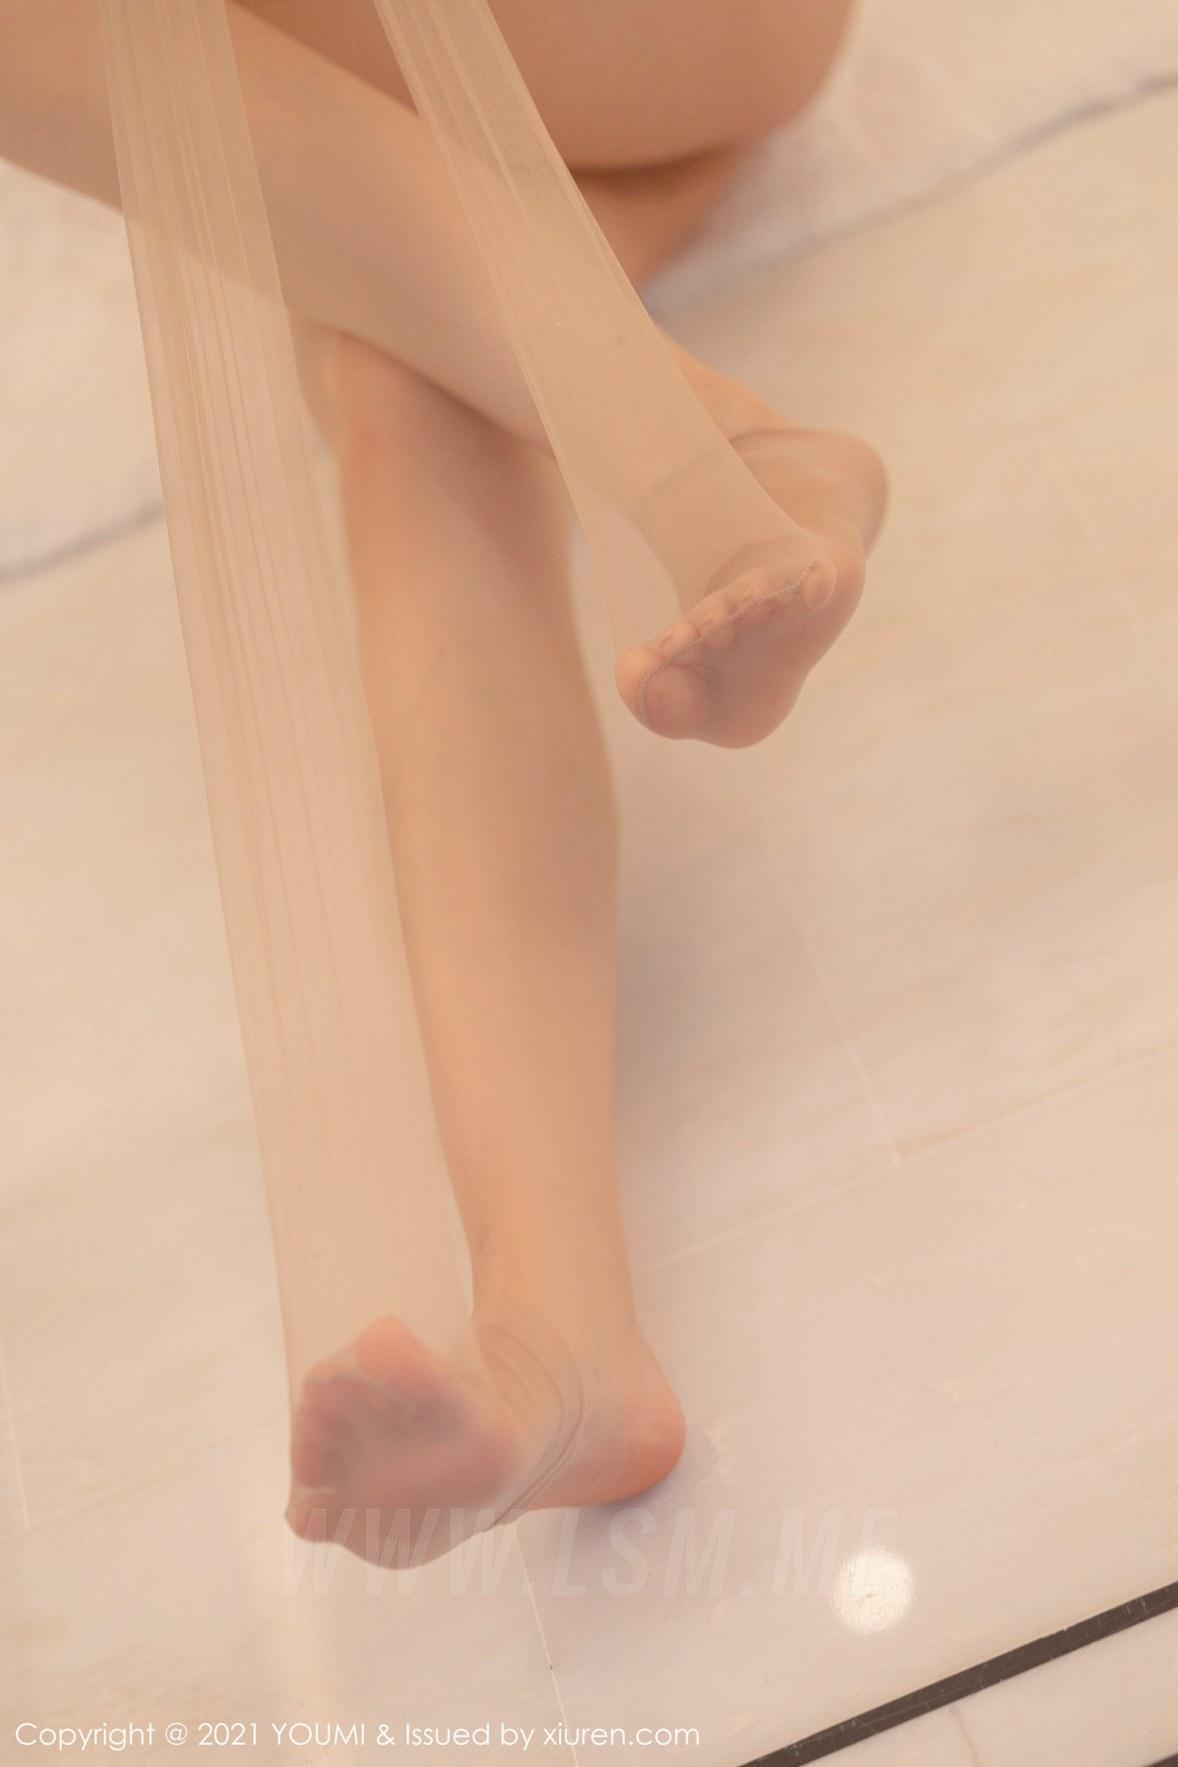 649 057 myc 3600 5400 - YOUMI 尤蜜荟 Vol.649  粉色服饰 朱可儿Flower 澳门旅拍 33 - 尤蜜荟 -【免费在线写真】【丽人丝语】